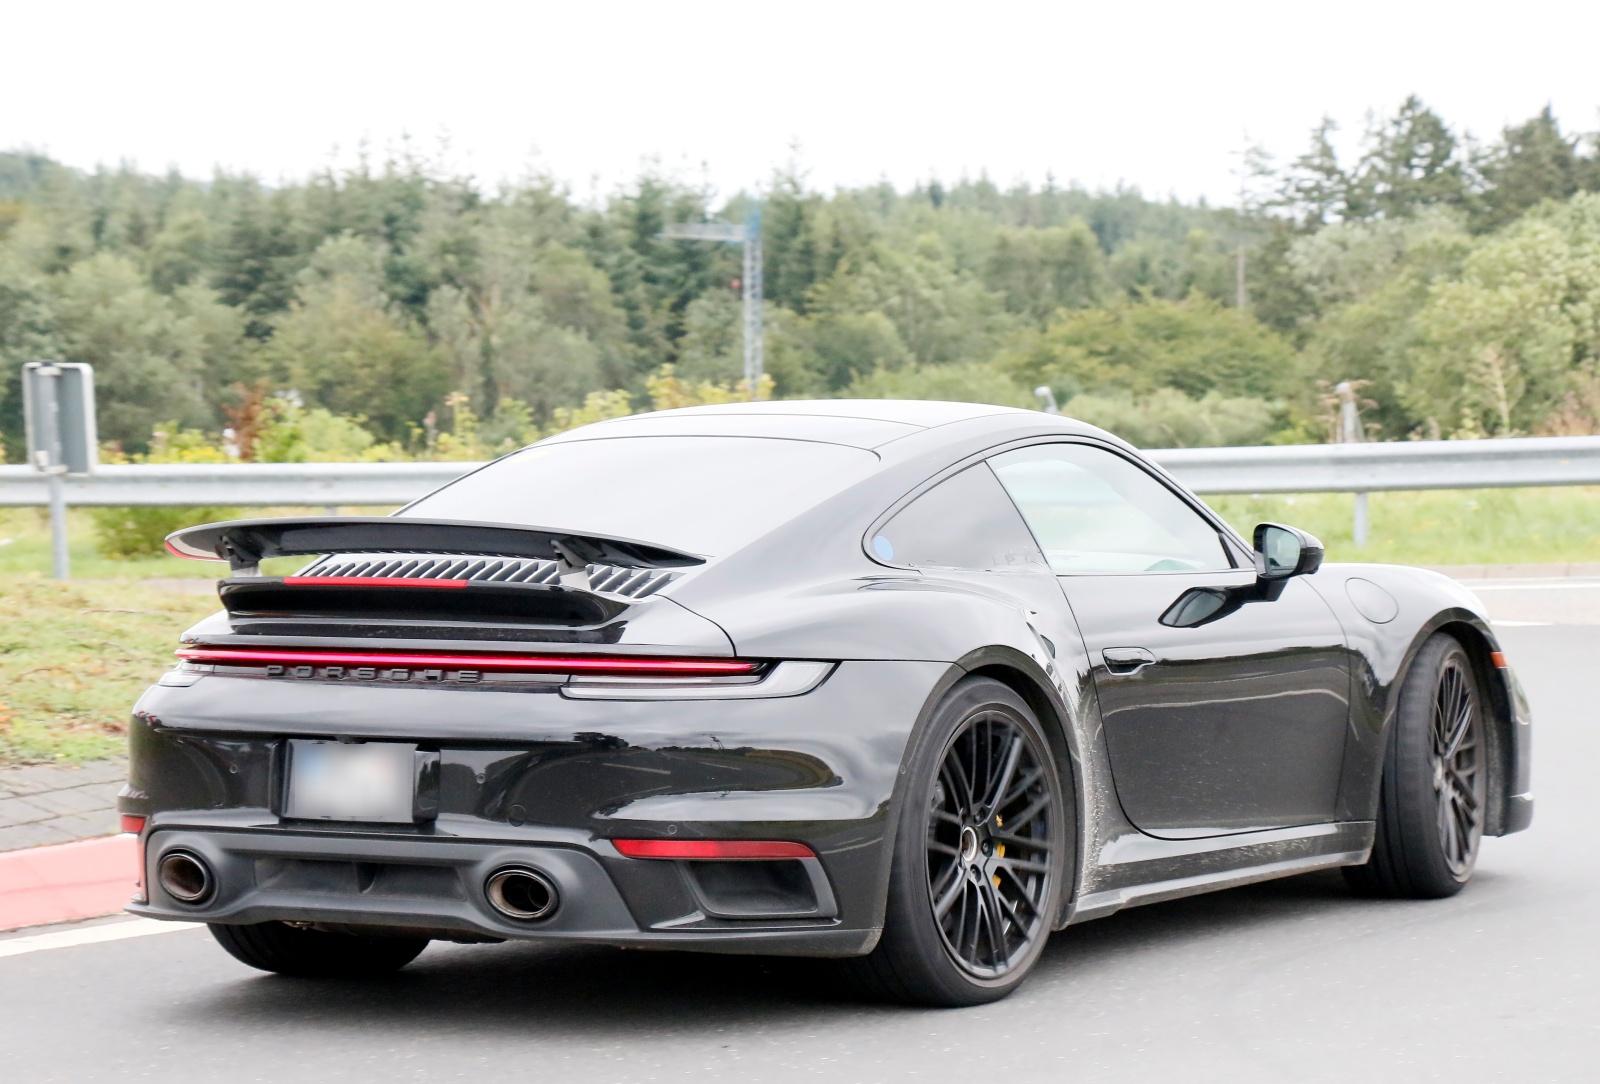 Hybrydowe Porsche 911 - tył, spoiler